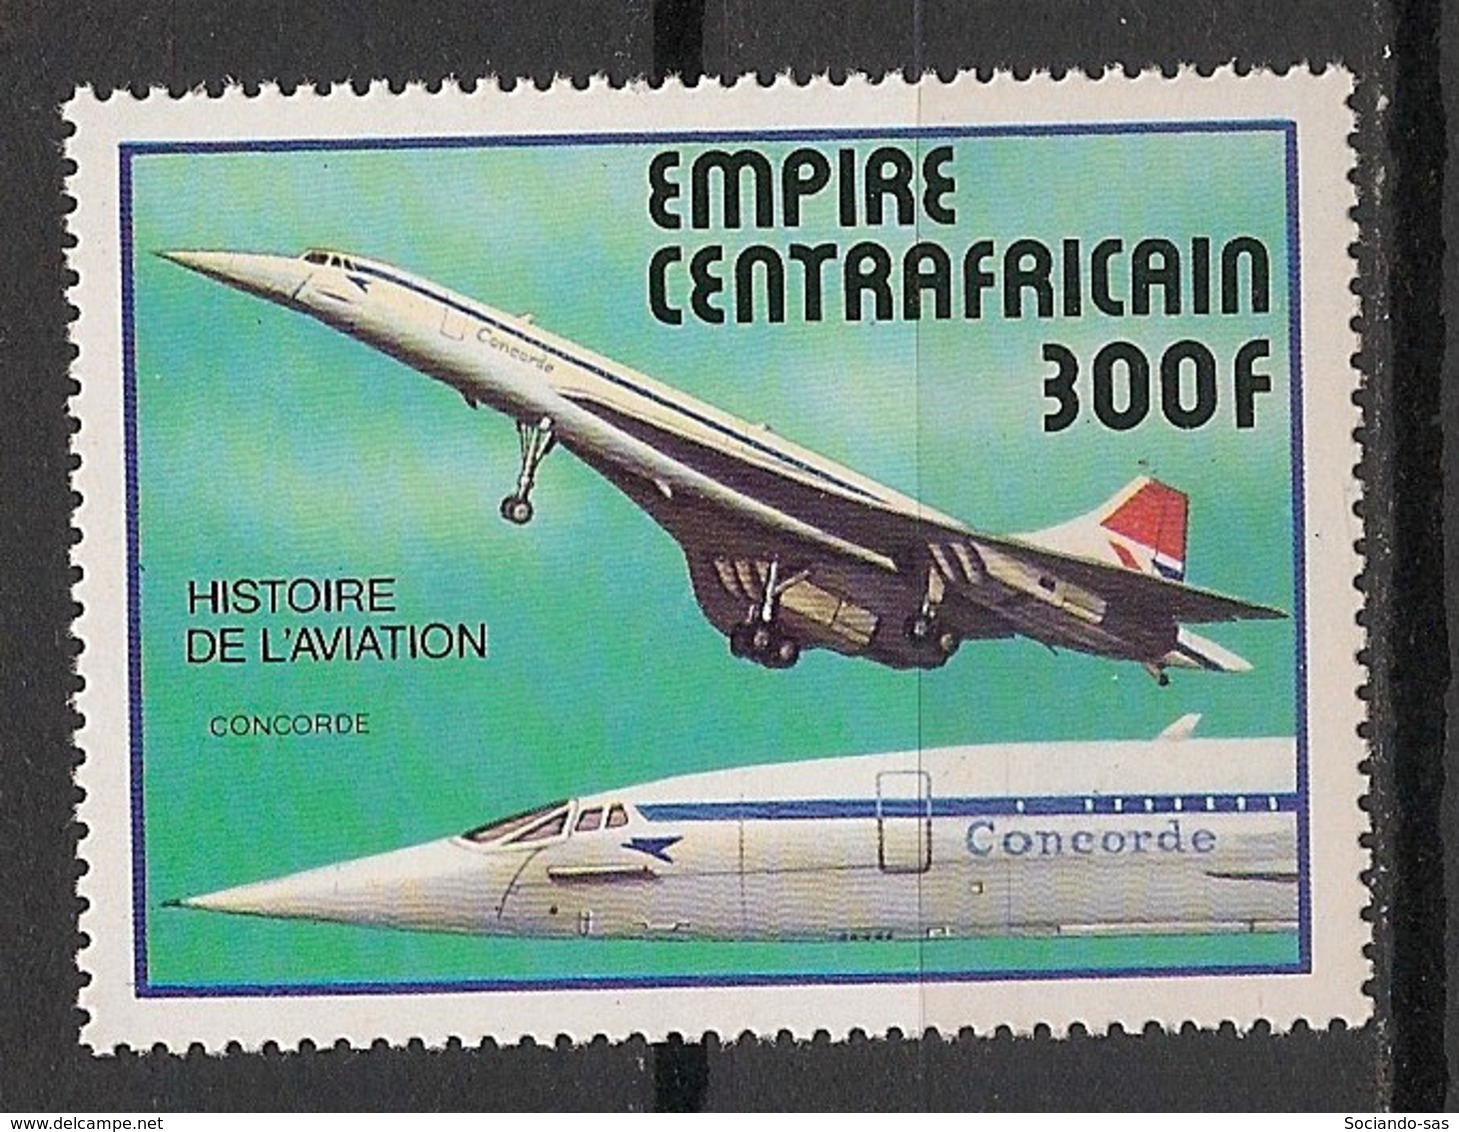 Centrafricaine - 1977 - N°Yv. 309 - Histoire De L'aviation / Concorde - Neuf Luxe ** / MNH / Postfrisch - Zentralafrik. Republik